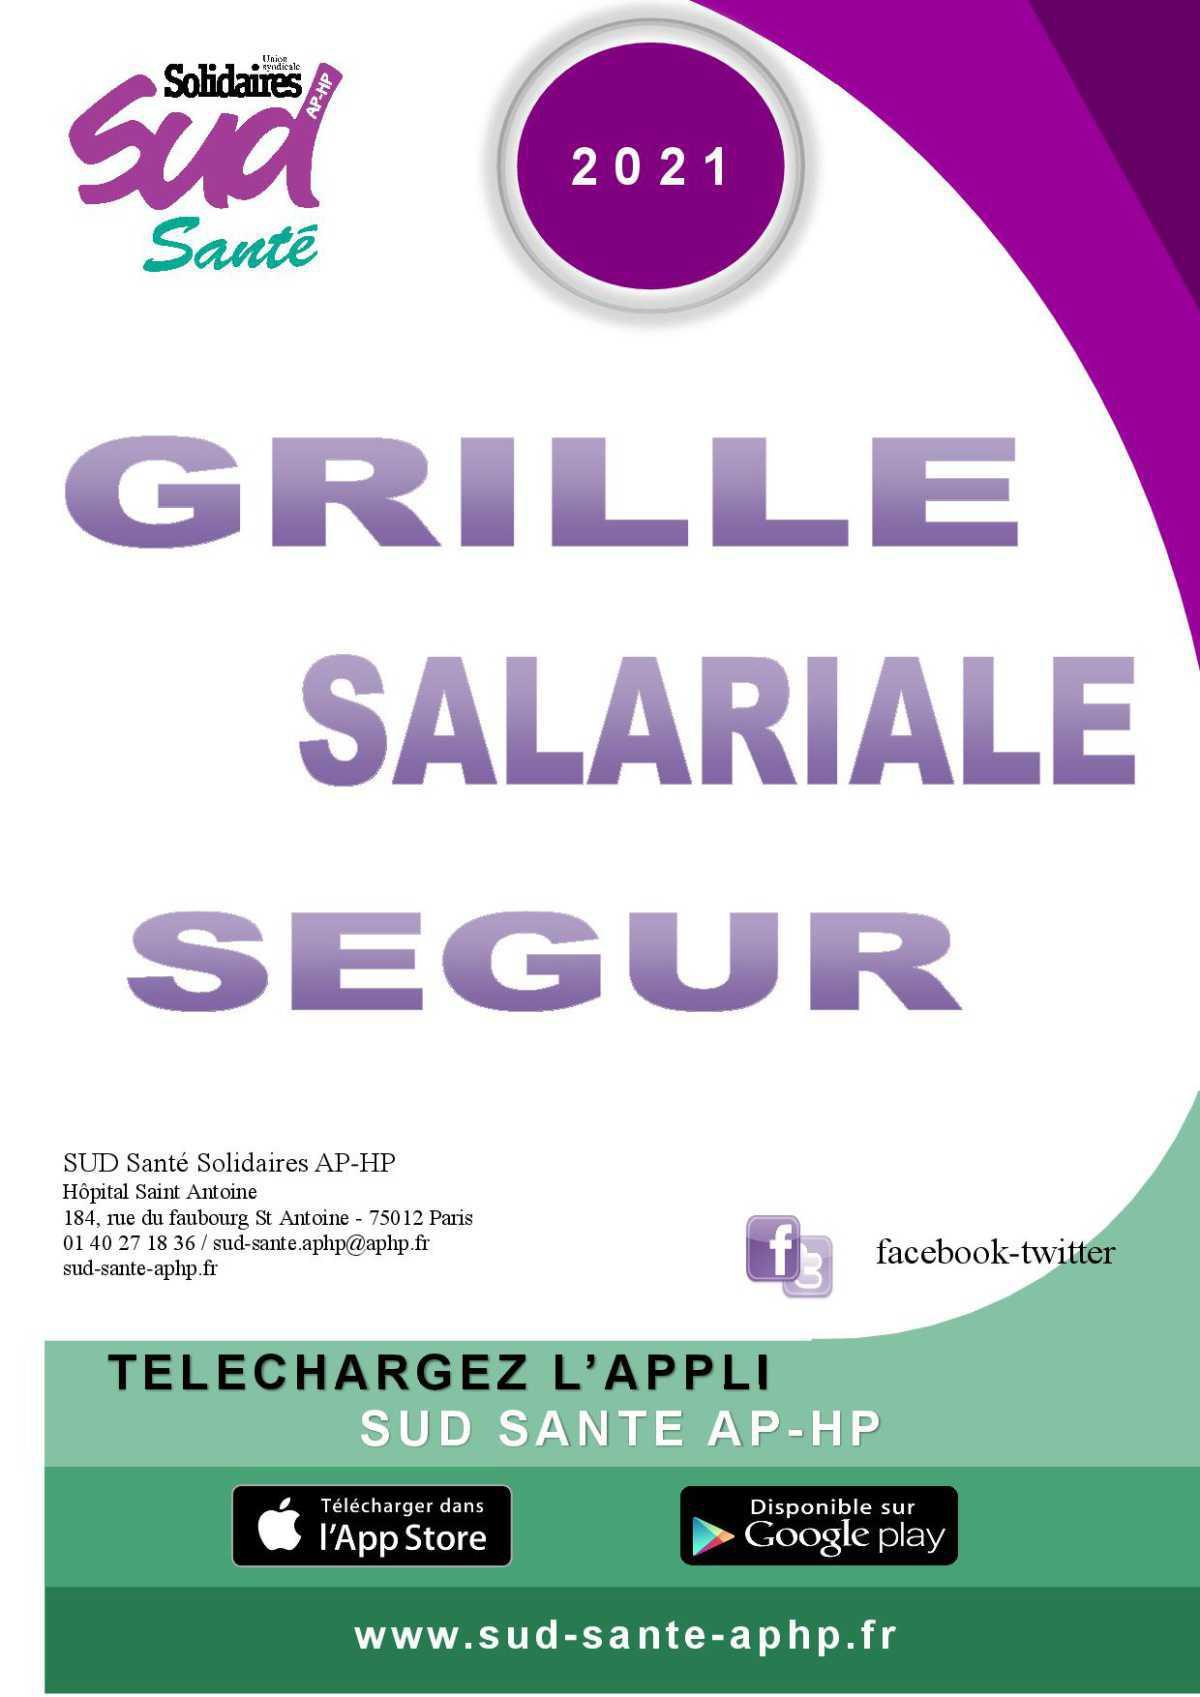 Grille salariale Ségur